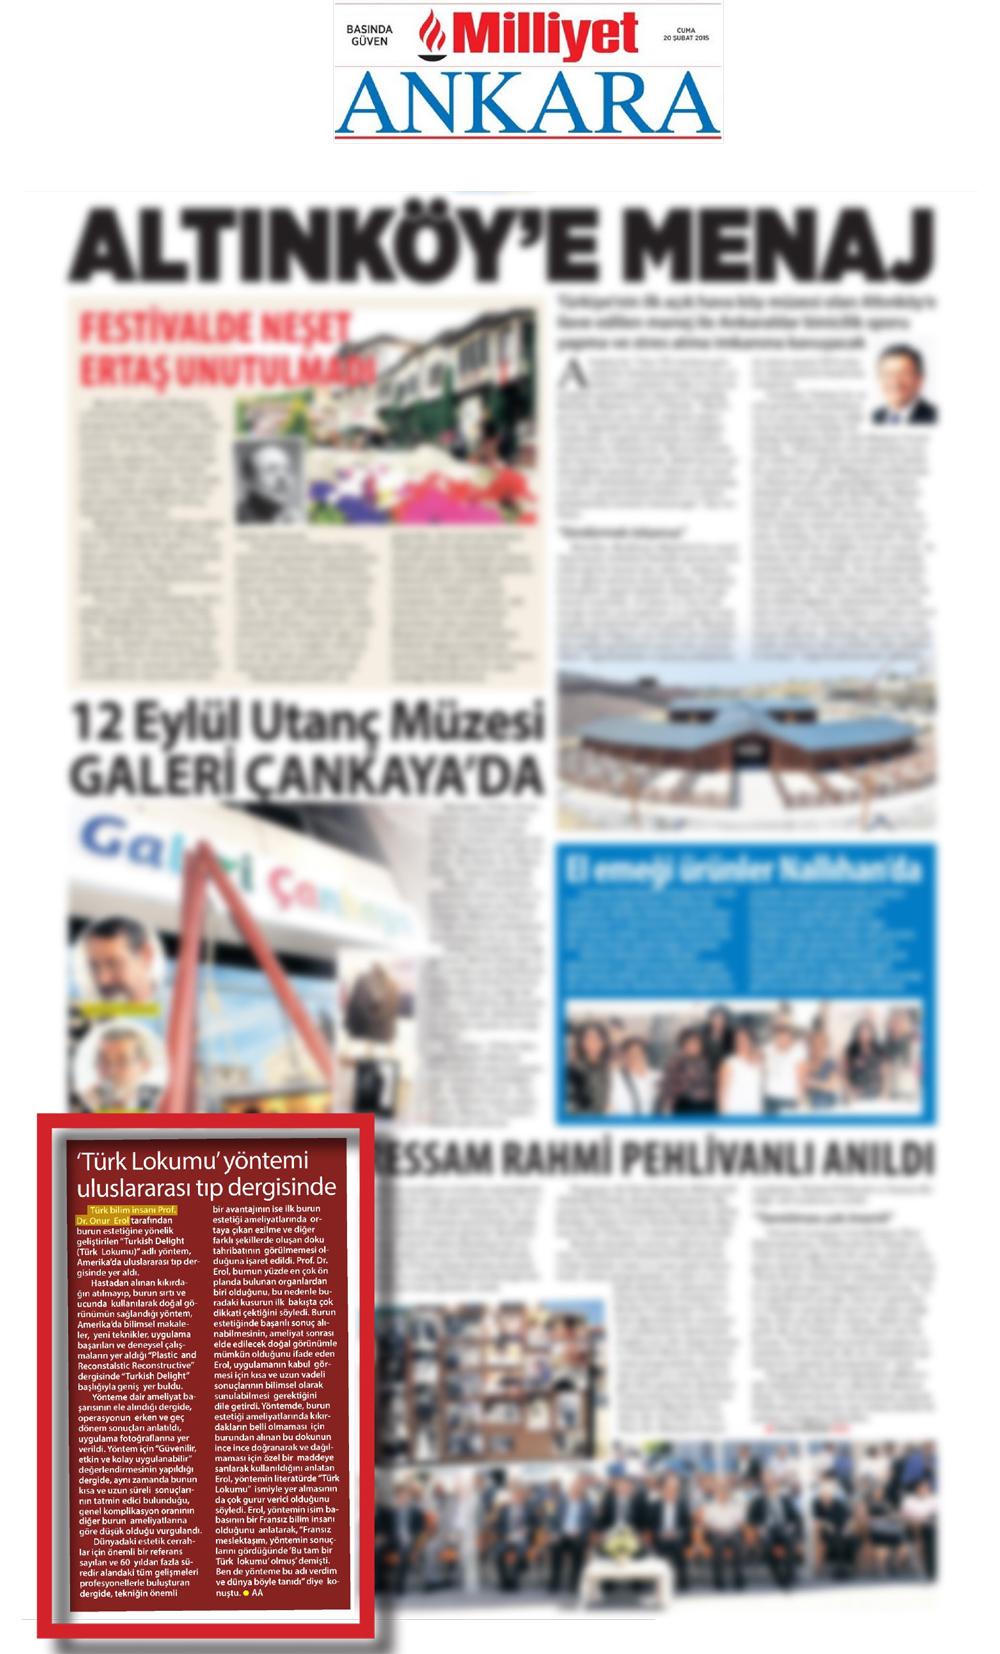 Onep--Prof.-Dr.-Onur-Erol-Milliyet-Ankara-11